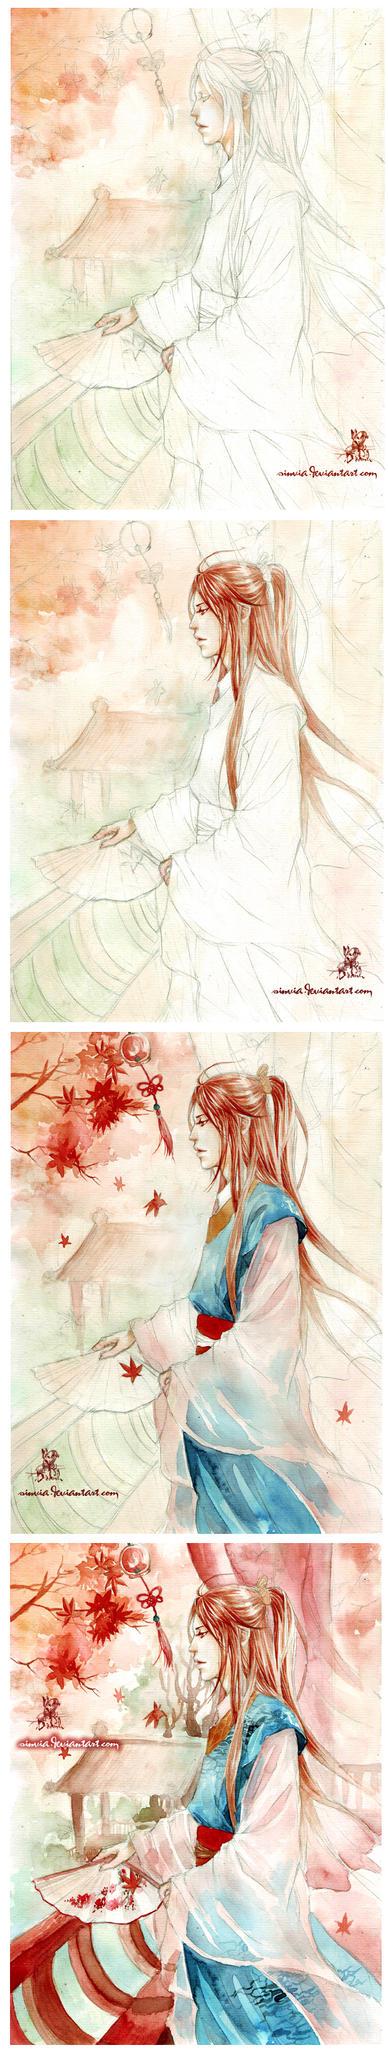 WIP Phong Tu by sinvia